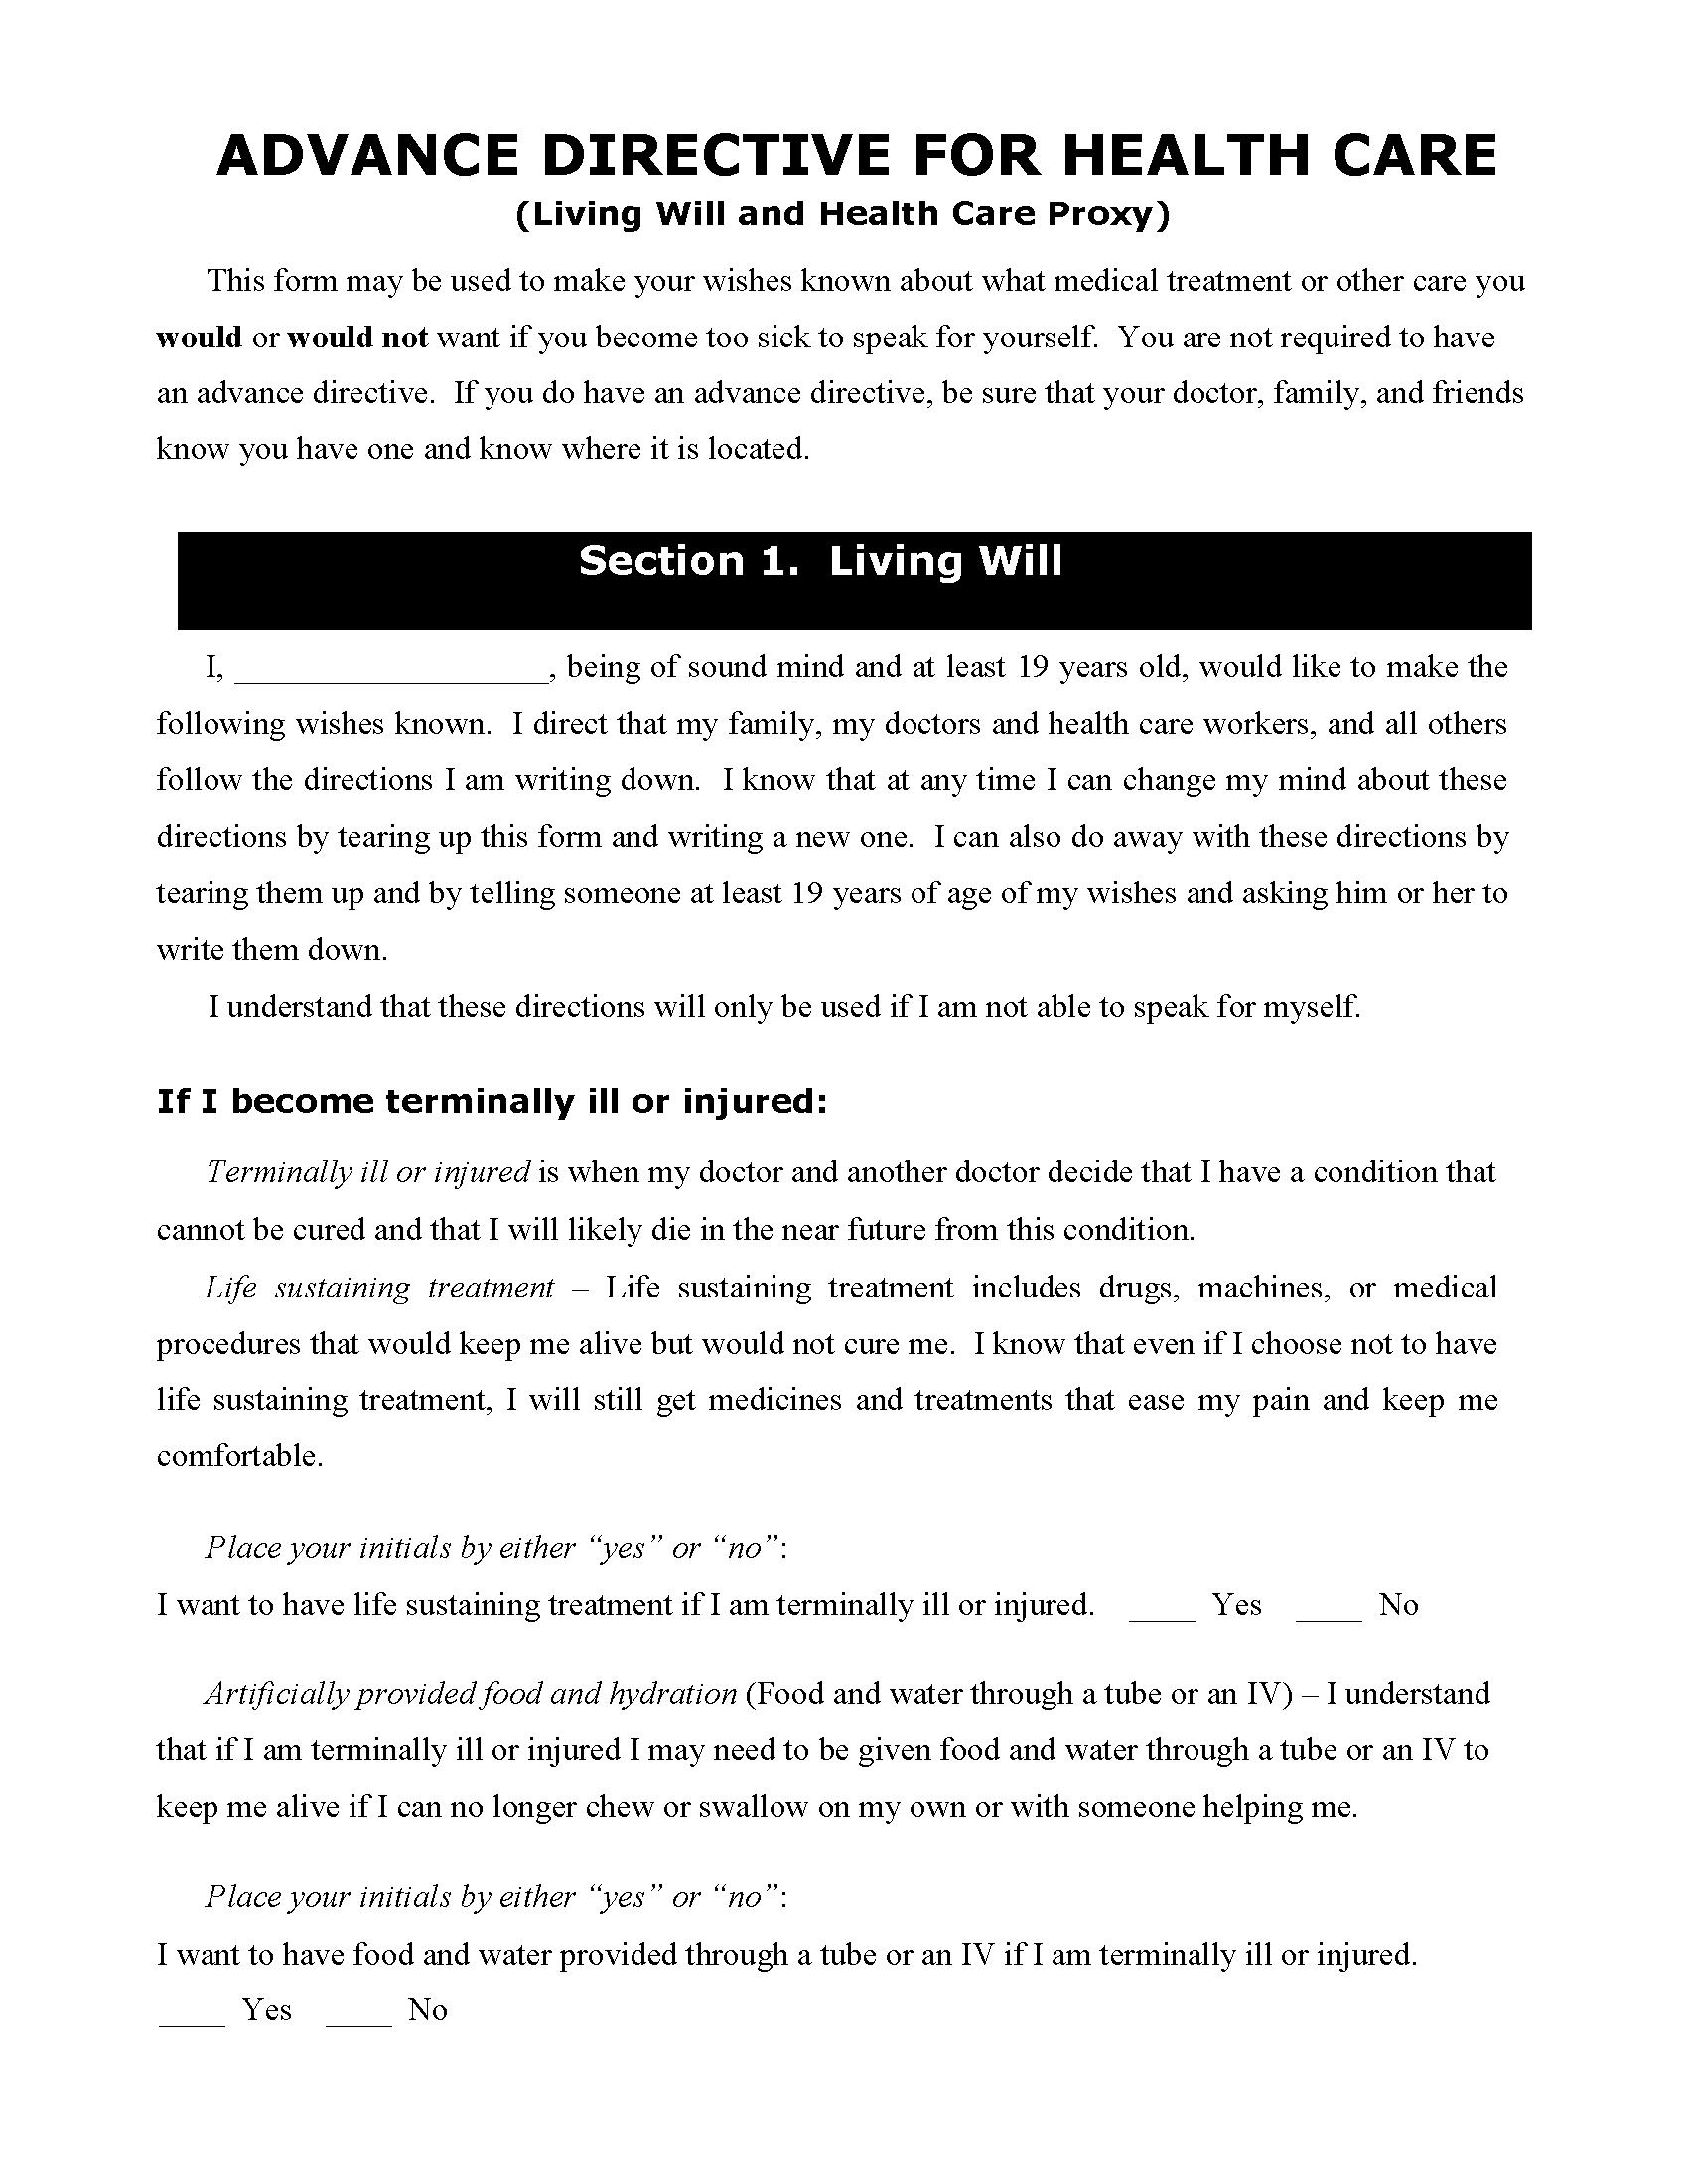 Georgia Living Will Form Fillable PDF Free Printable